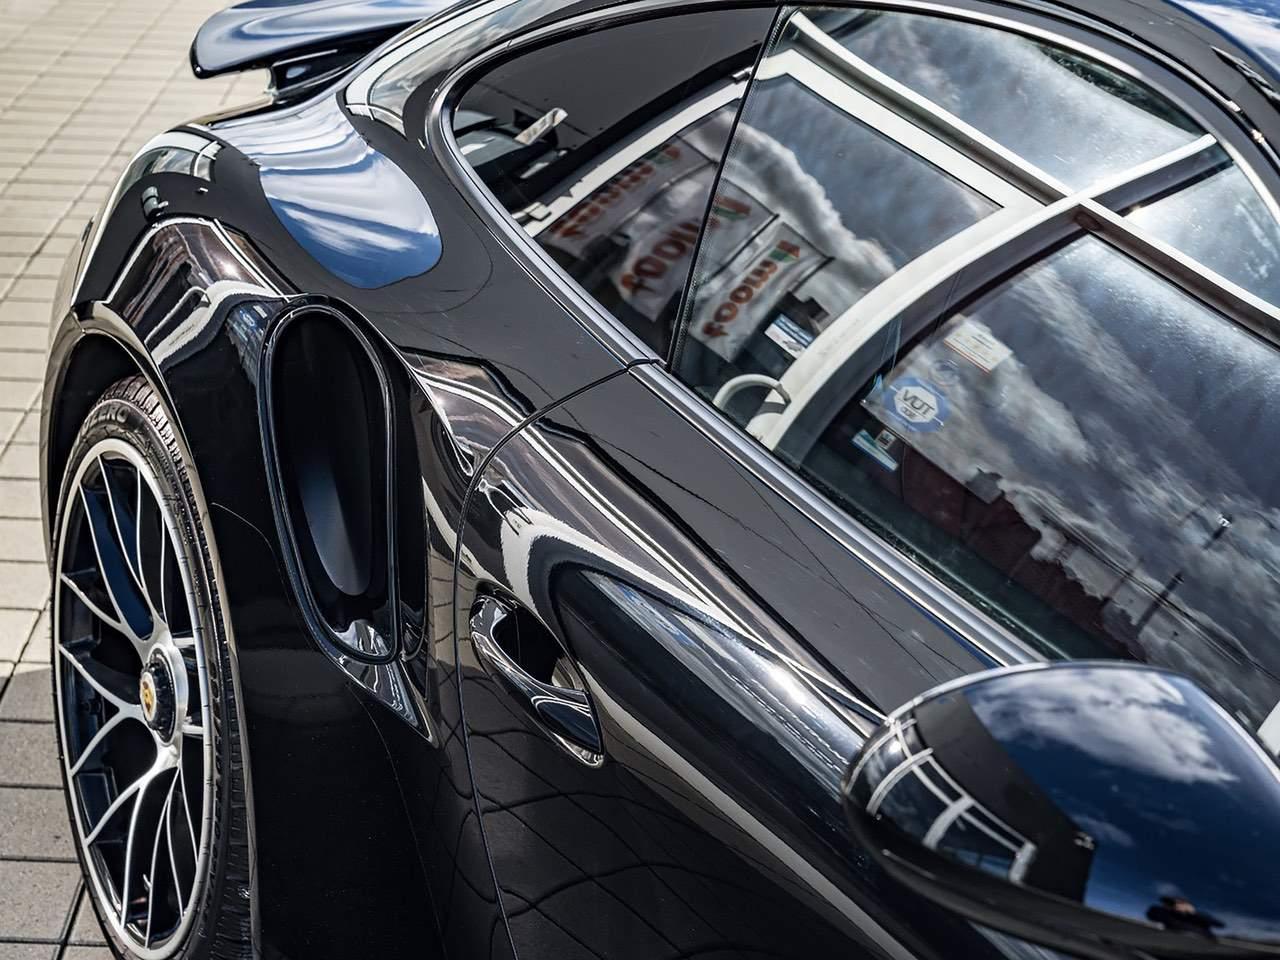 Porsche-911-Turbo-S-1